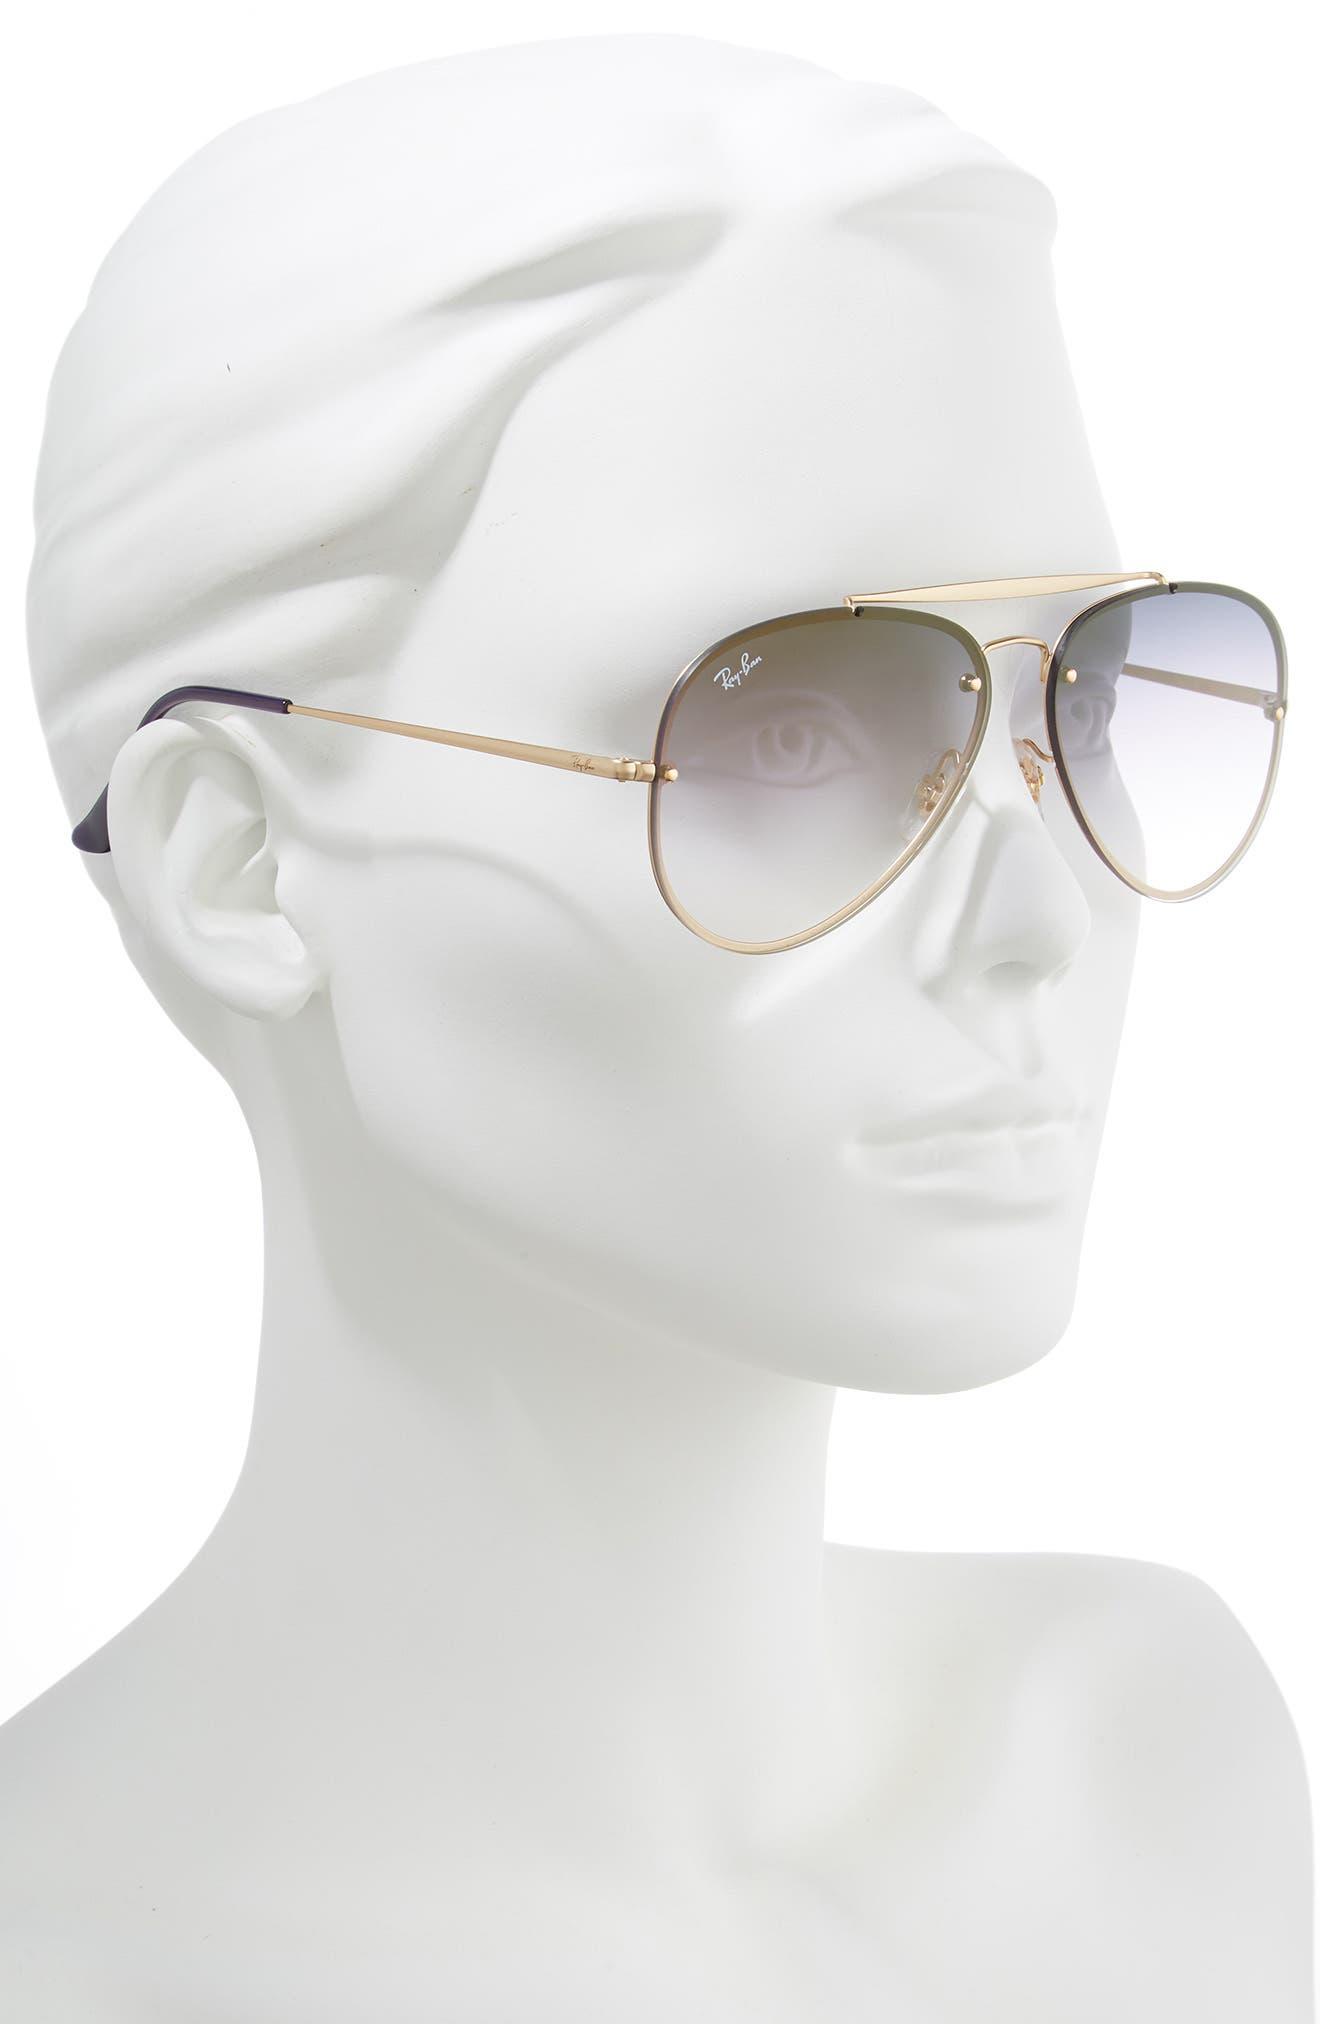 61mm Mirrored Lens Aviator Sunglasses,                             Alternate thumbnail 2, color,                             GOLD/ BLUE VIOLET GRADIENT